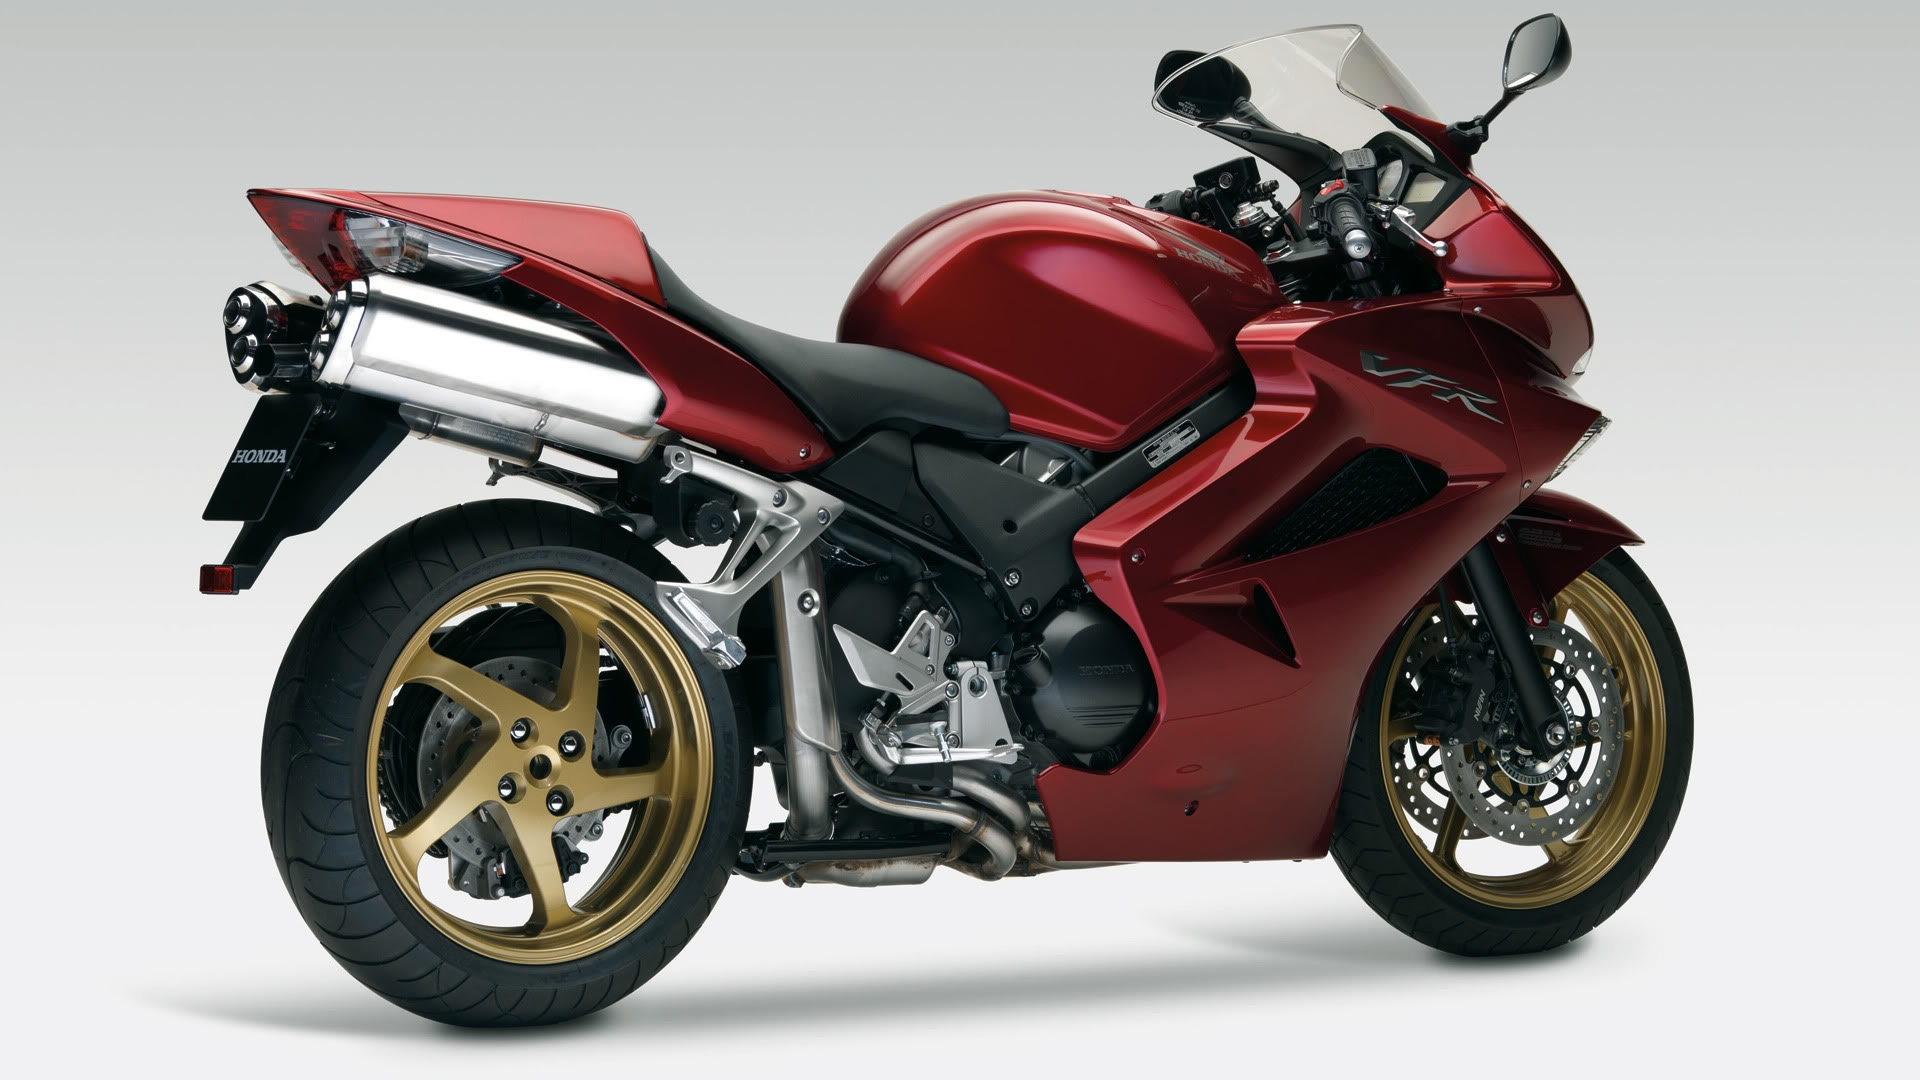 nouveaut pneu moto 2016 dunlop sportmax roadsmart iii chewing gomme. Black Bedroom Furniture Sets. Home Design Ideas